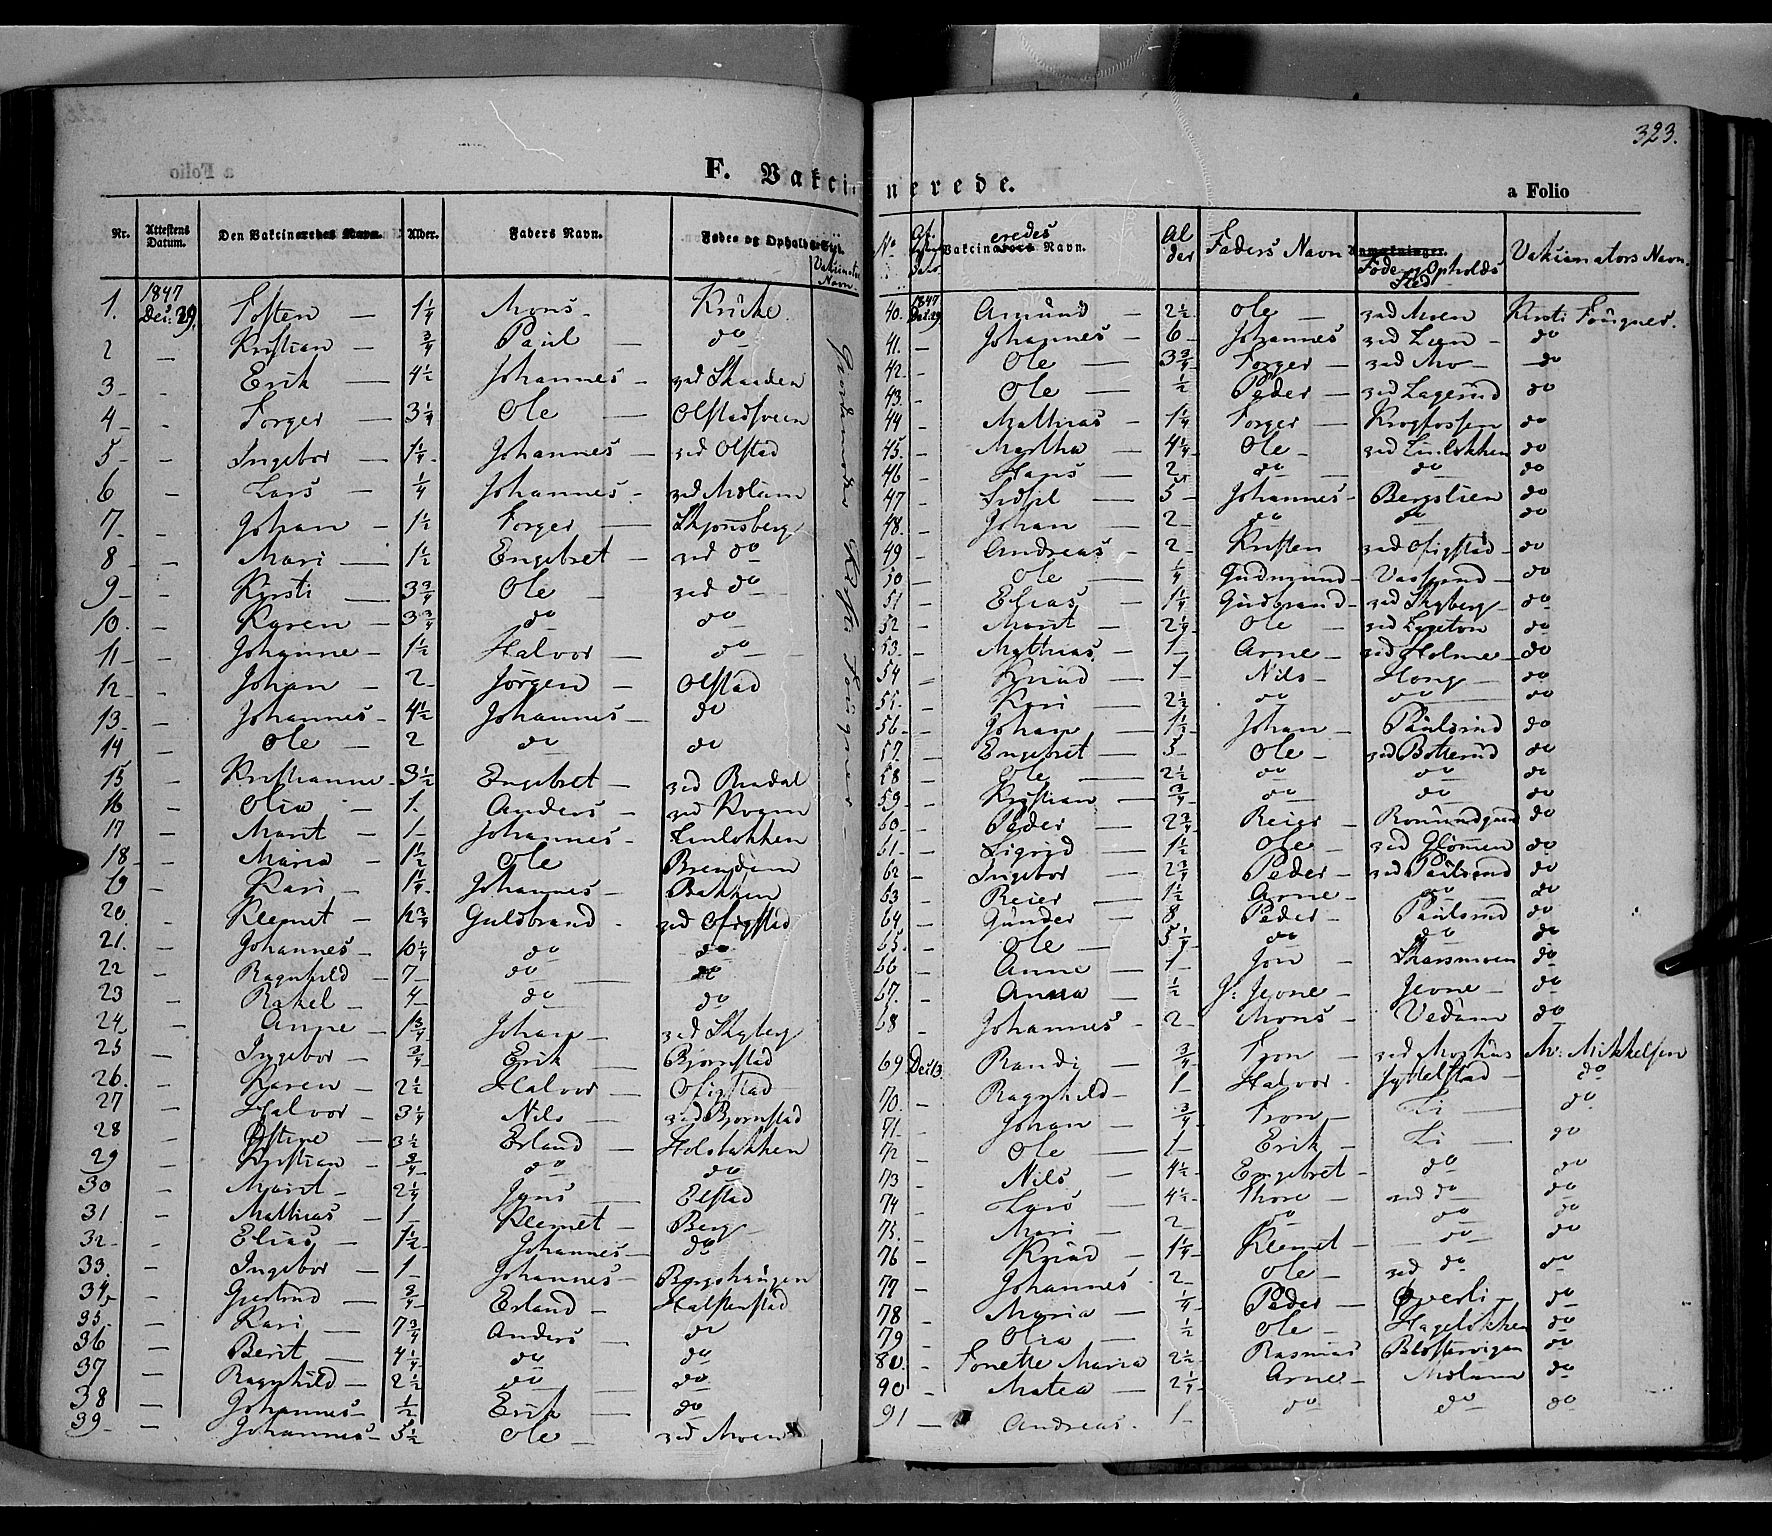 SAH, Øyer prestekontor, Ministerialbok nr. 5, 1842-1857, s. 323